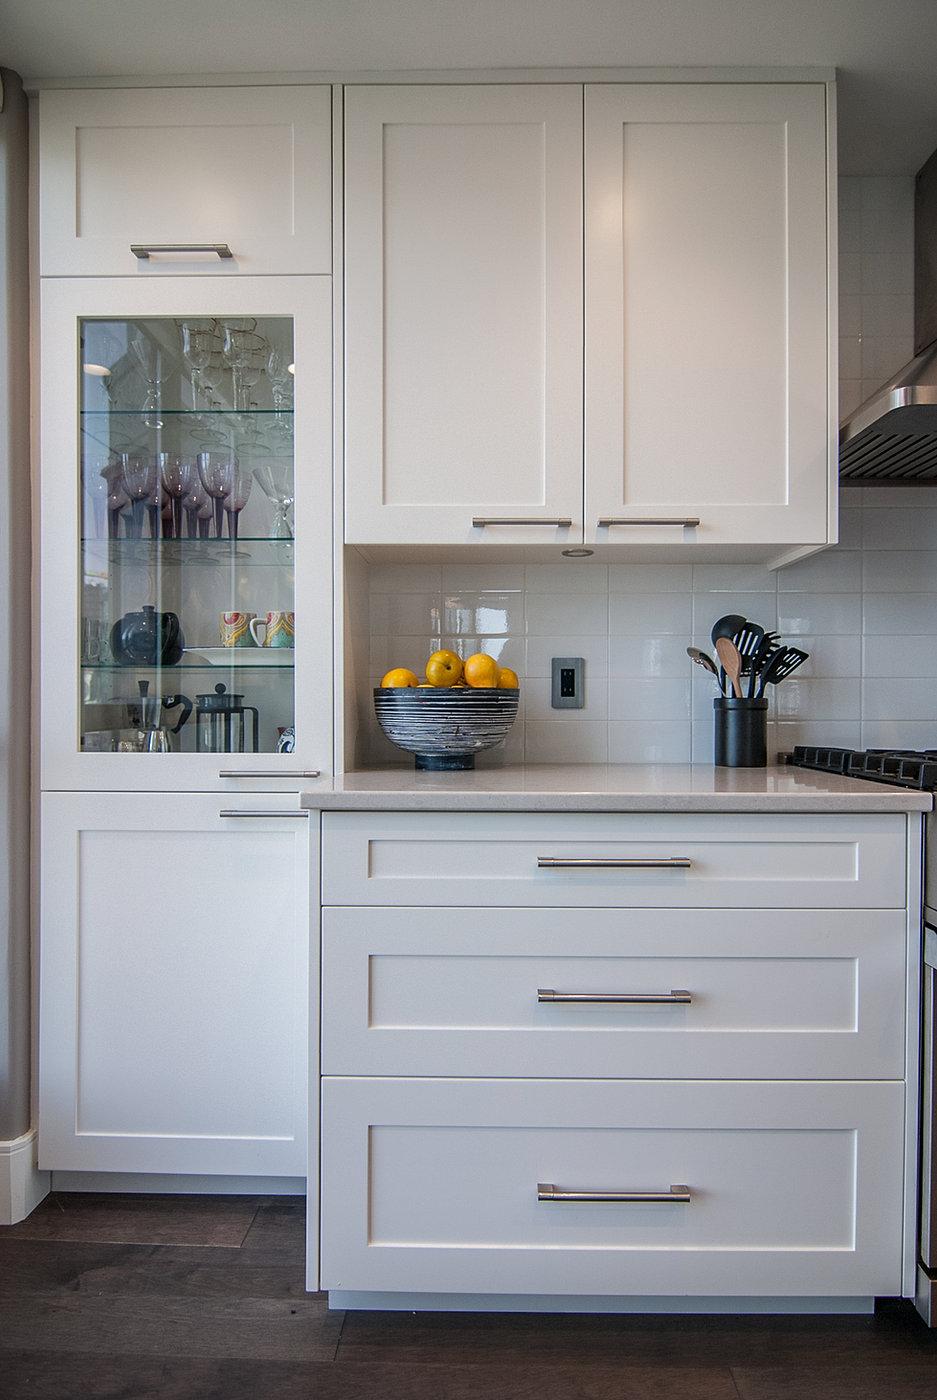 Duke Custom Kitchens | Kitchen Design and Manufacturing, Vancouver ...